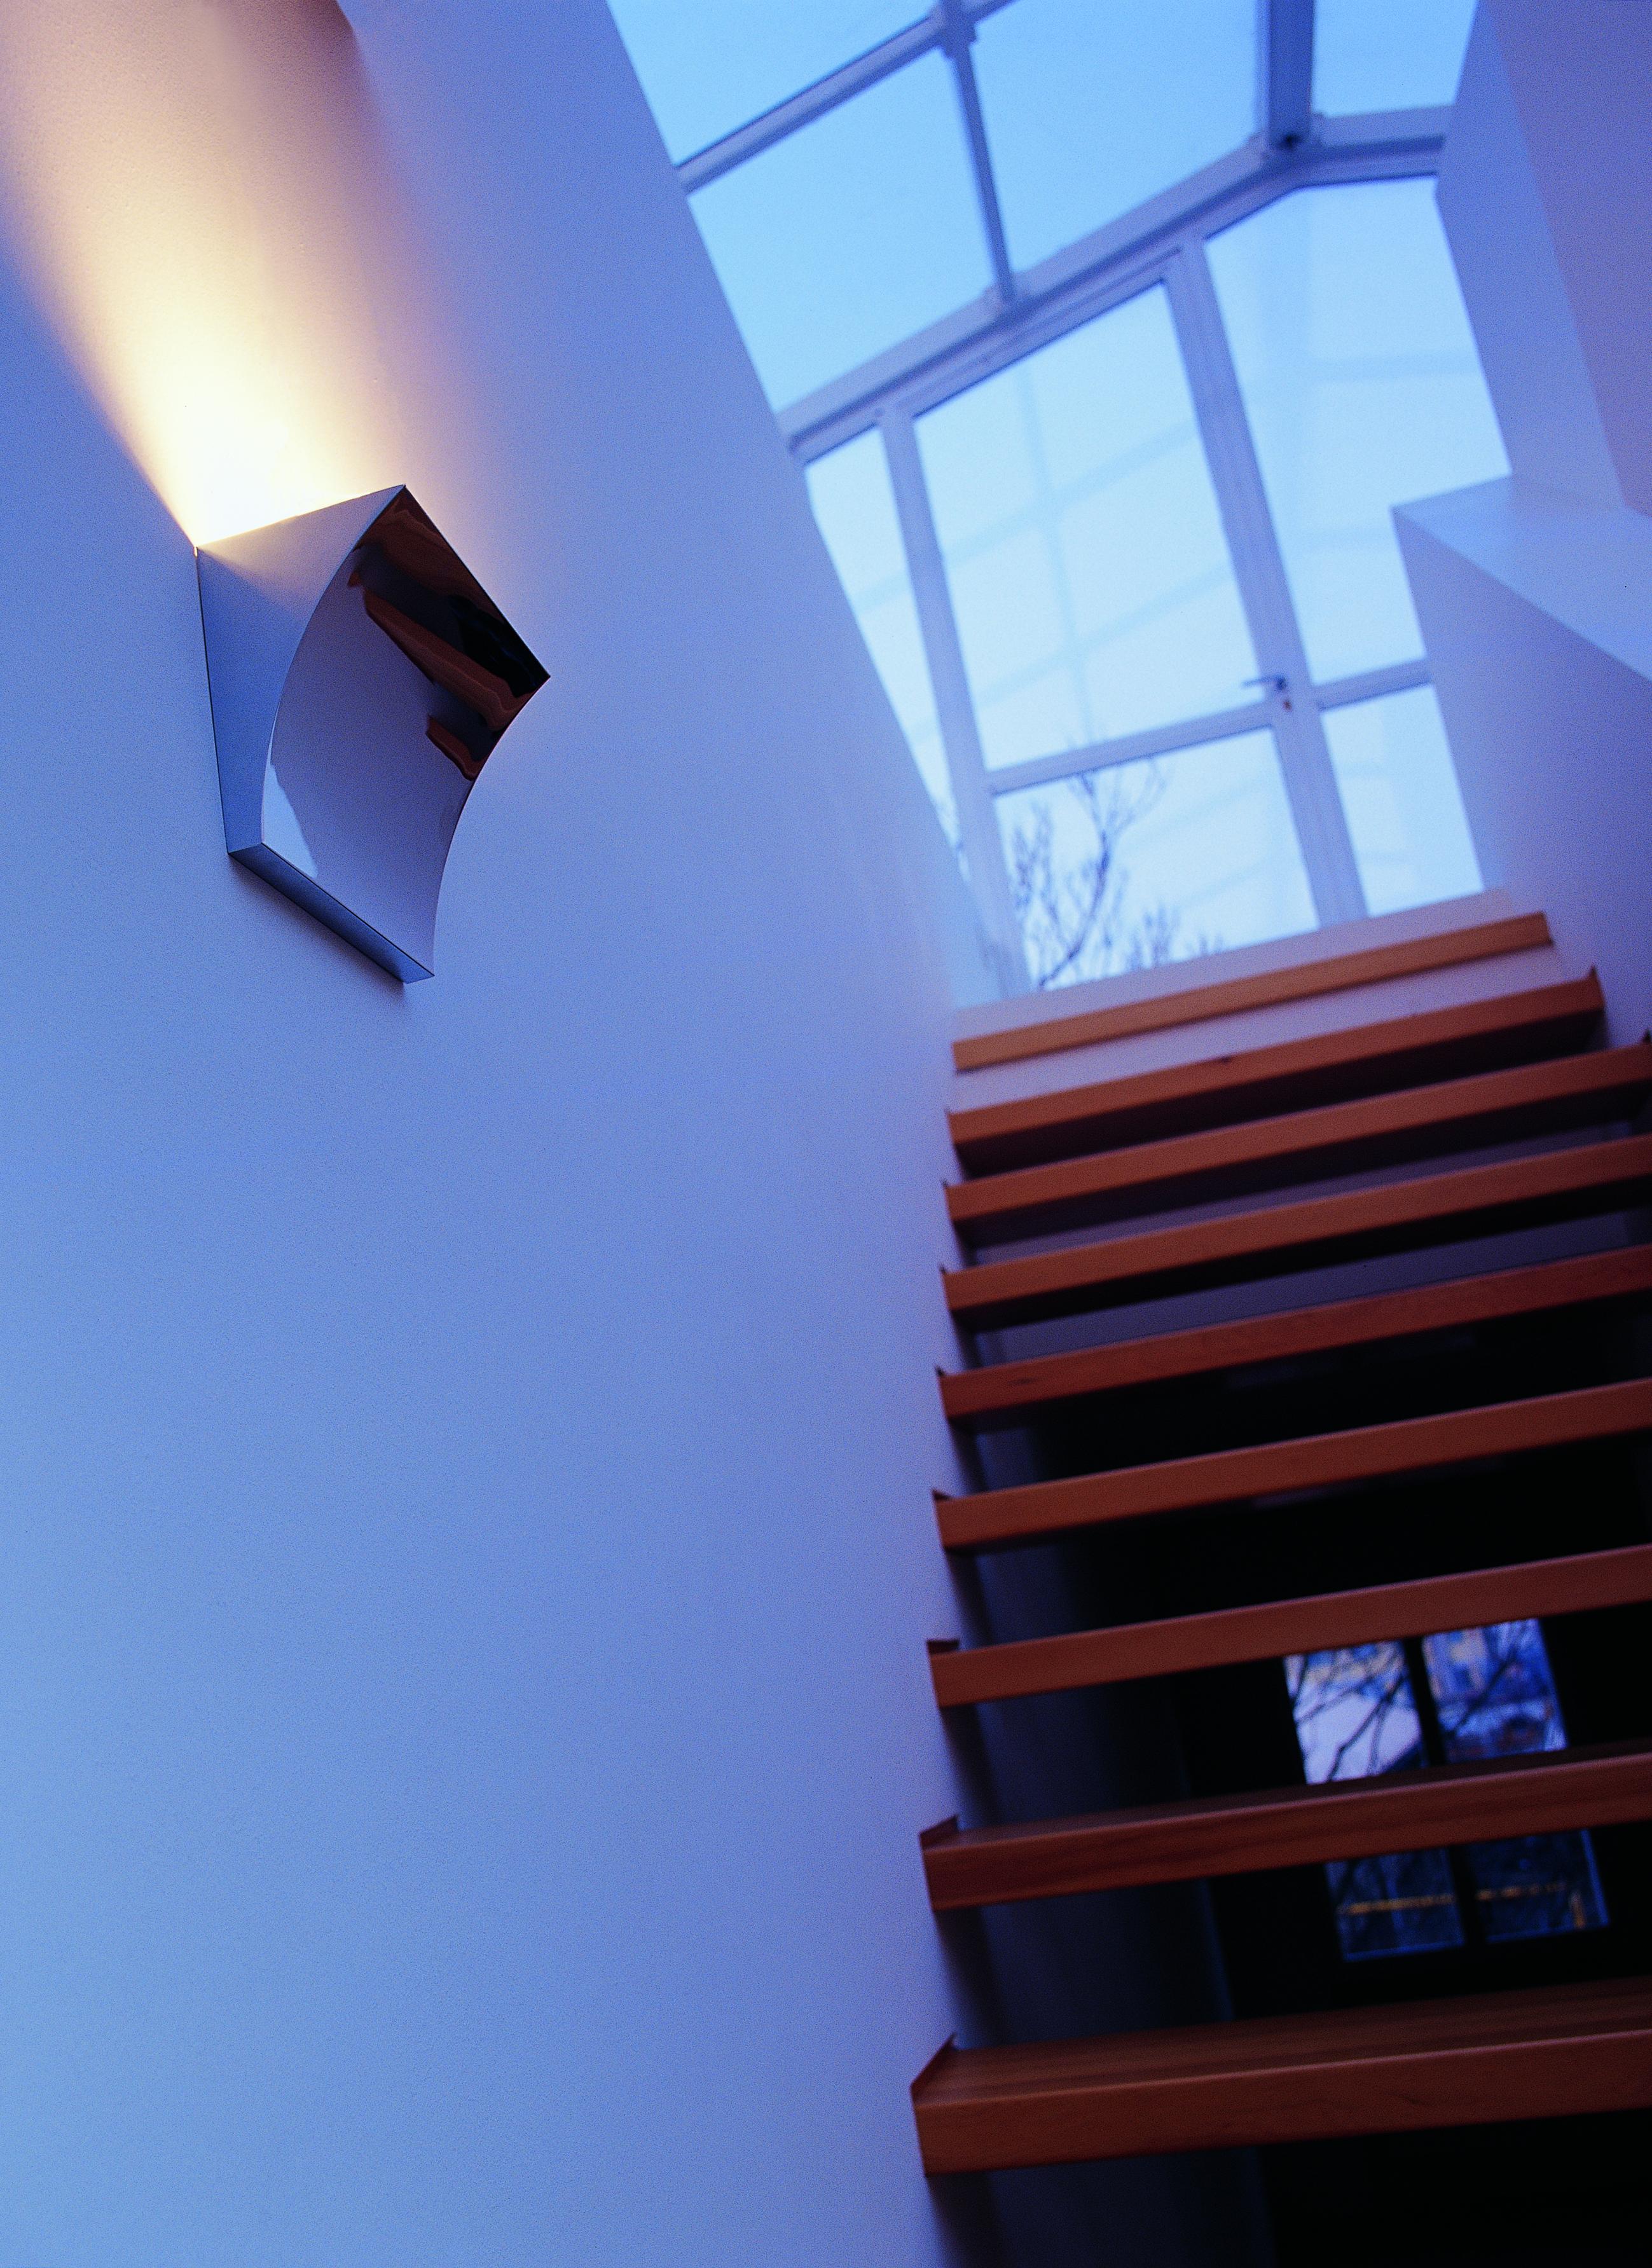 Pochette LED provides uplighting with a minimalist aesthetic.